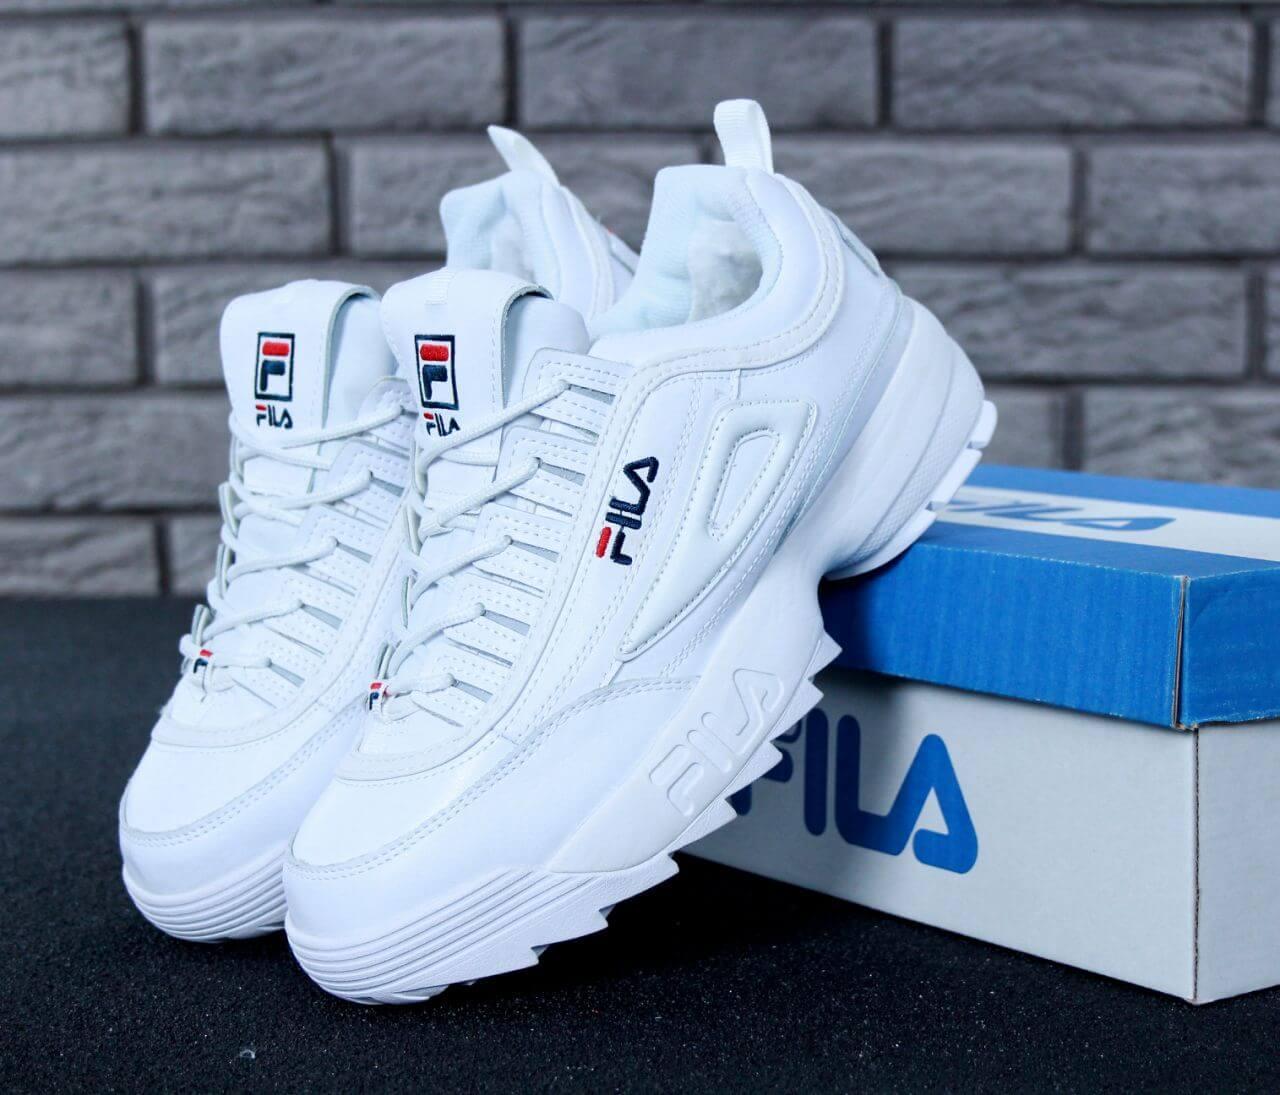 Кроссовки Fila Disruptor 2 Bright White с мехом - Интернет магазин обуви  «im-РоLLi 801c856aa0376